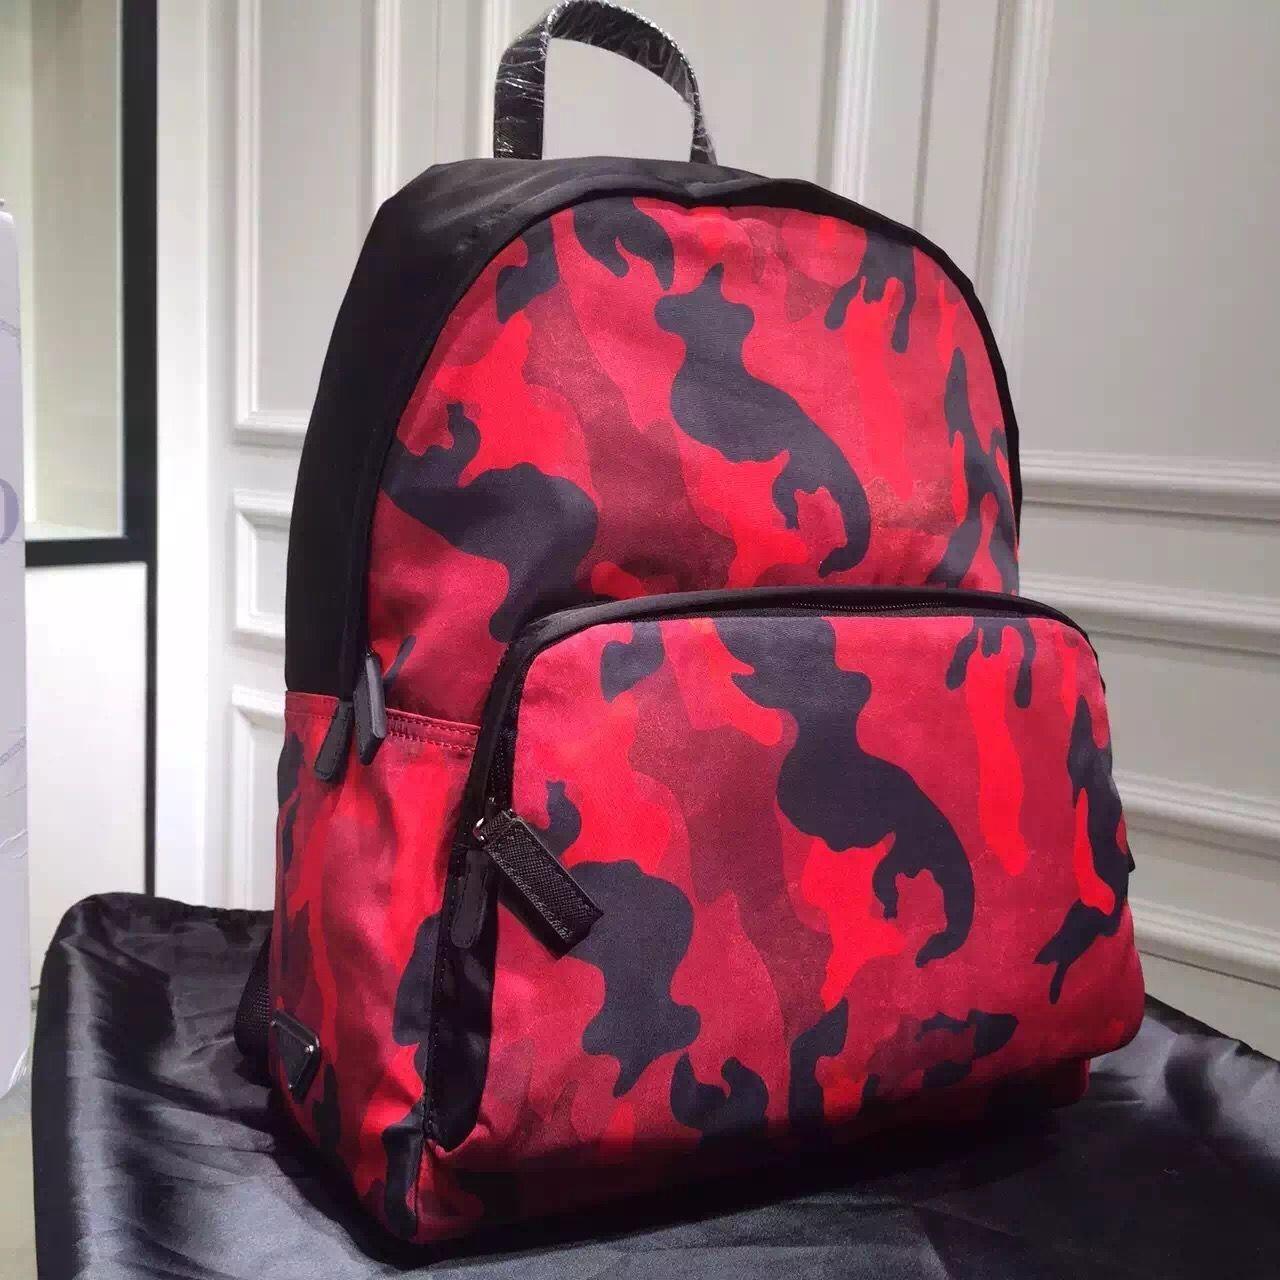 bf076cd5cdd086 Prada Red Camo Backpack – Patmo Technologies Limited